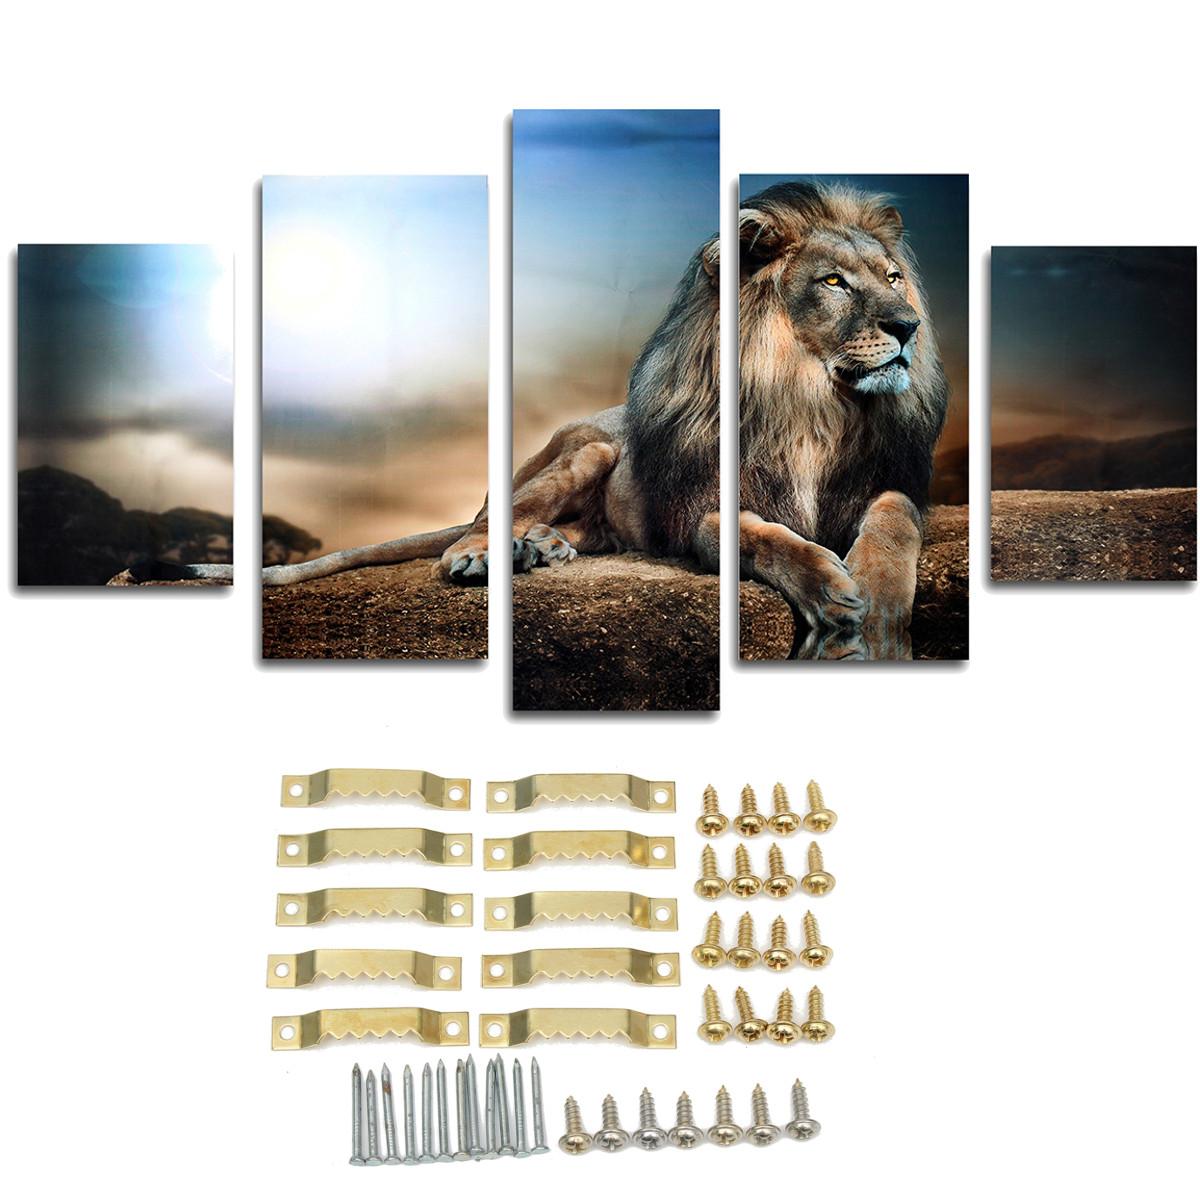 5PCS Frameless Canvas Print Sitting Lion Wall Art Painting Picture Home Decoration Paper Art